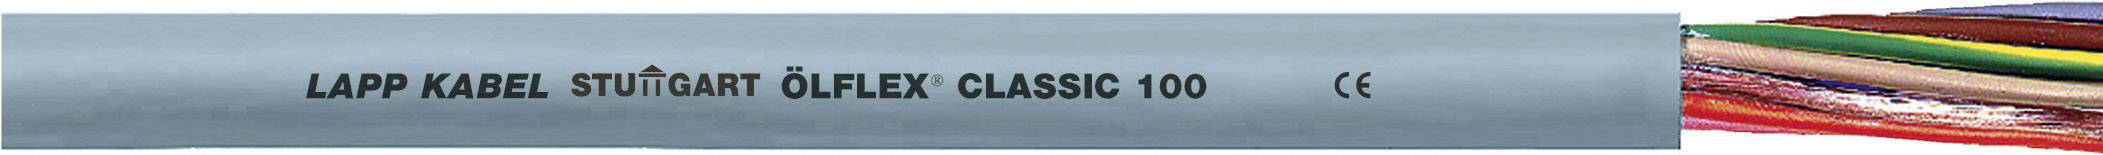 Kabel LappKabel Ölflex CLASSIC 100 18G1,5 (0010074), PVC, 14,4 mm, 500 V, šedá, 1000 m